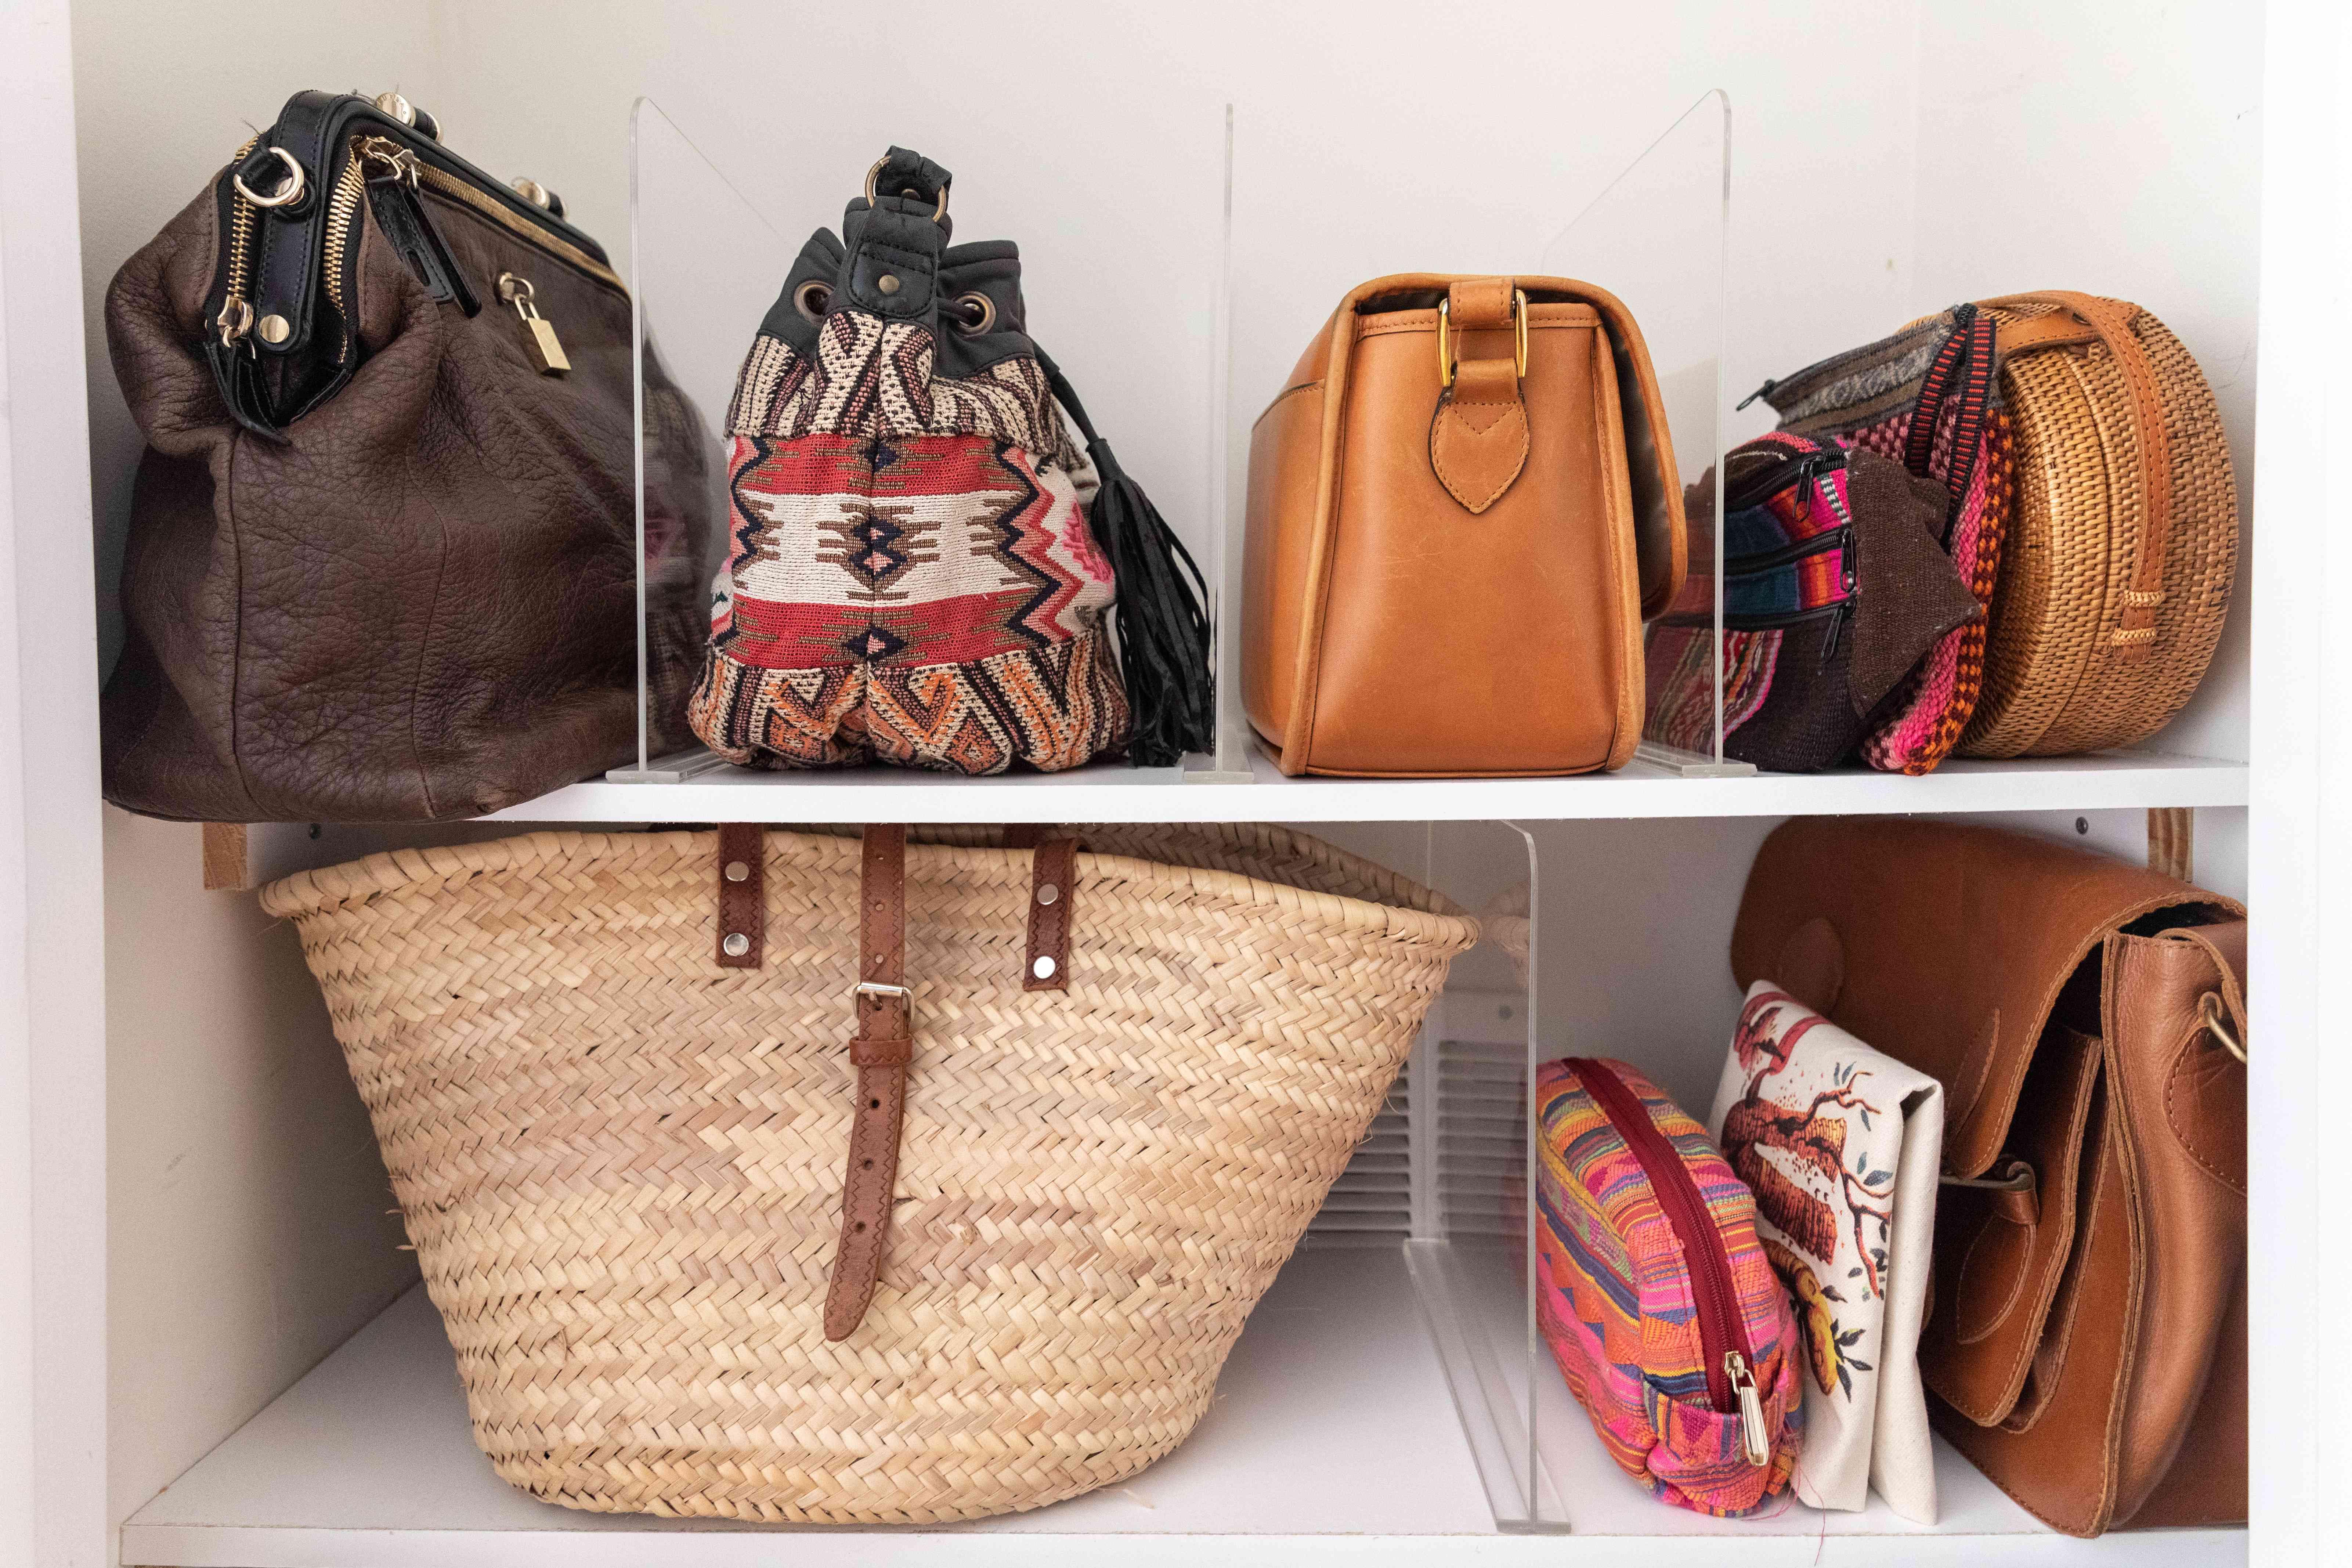 shelf dividers holding handbags